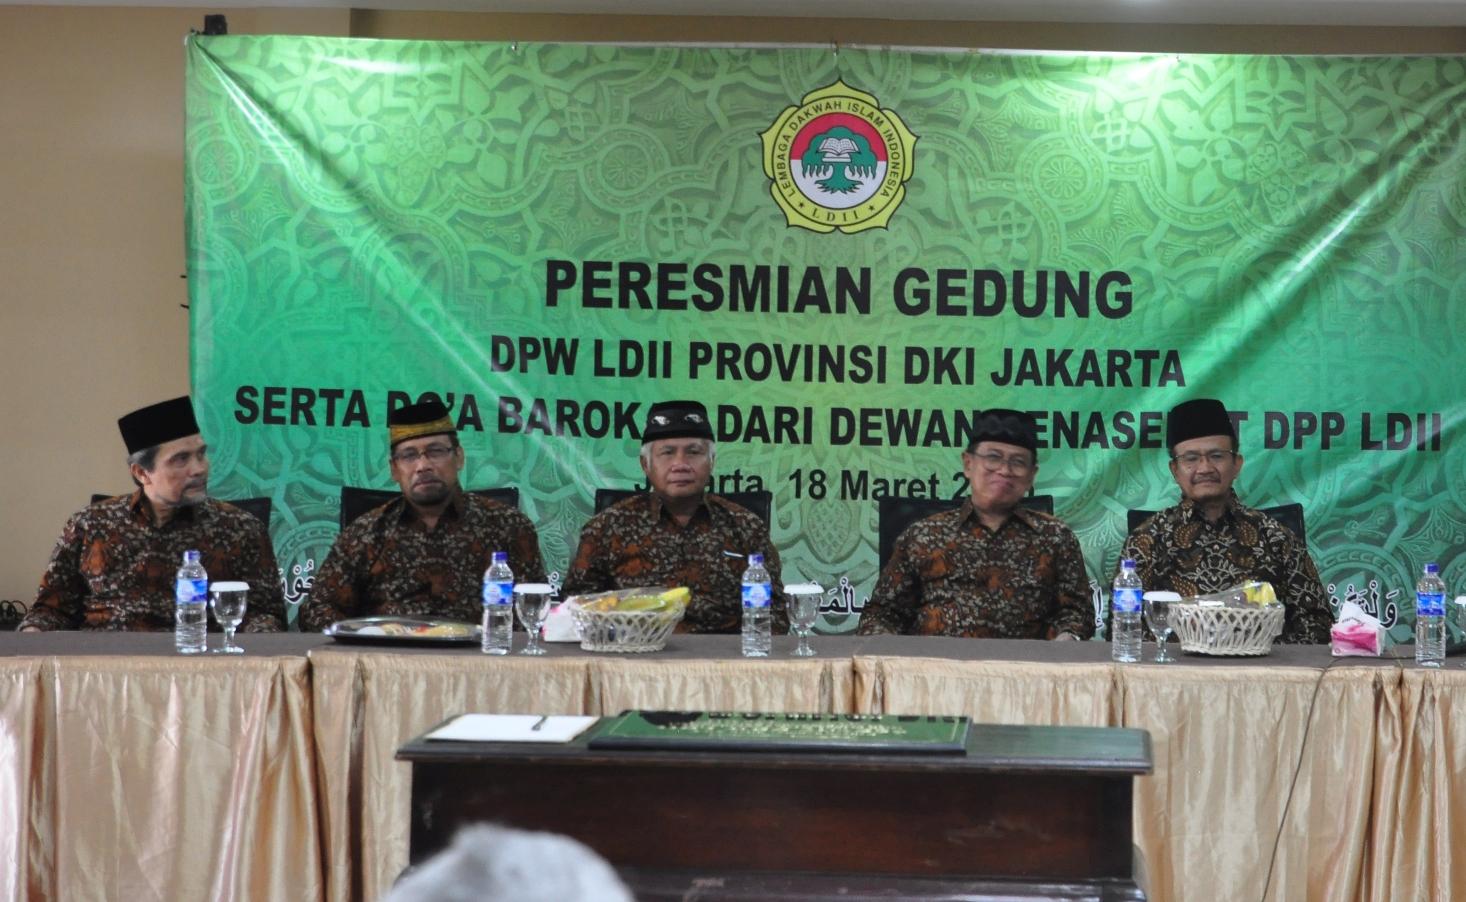 Peresmian Gedung DPW LDII DKI Jakarta